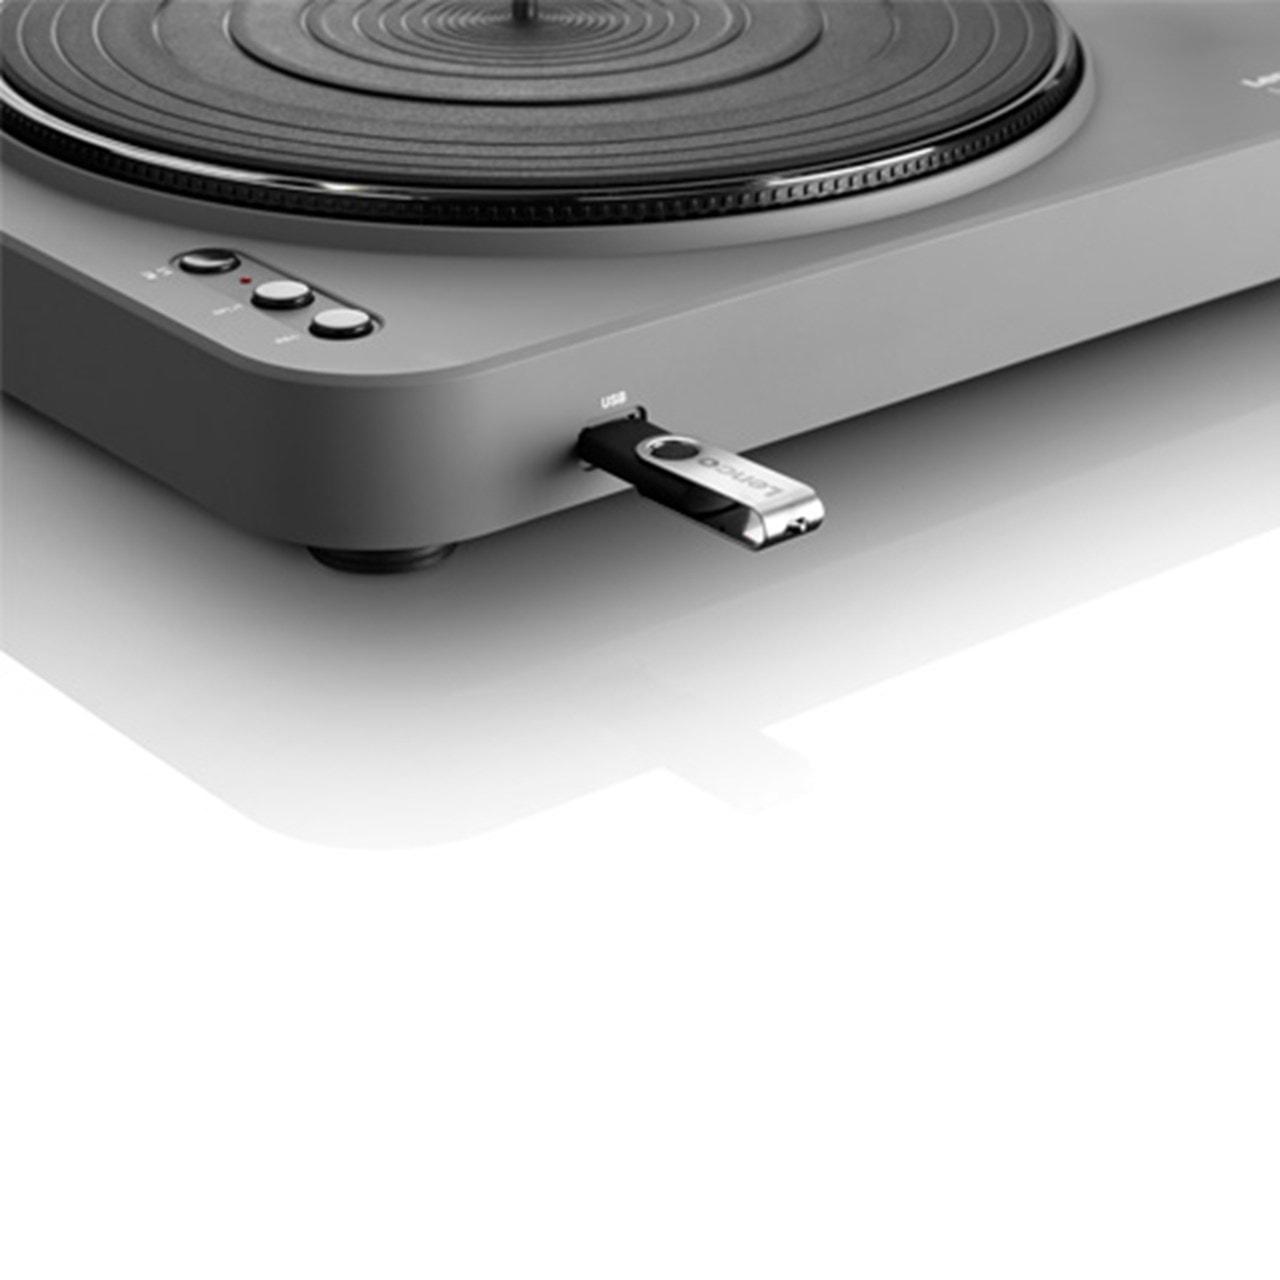 Lenco L-85 Grey USB Turntable - 3